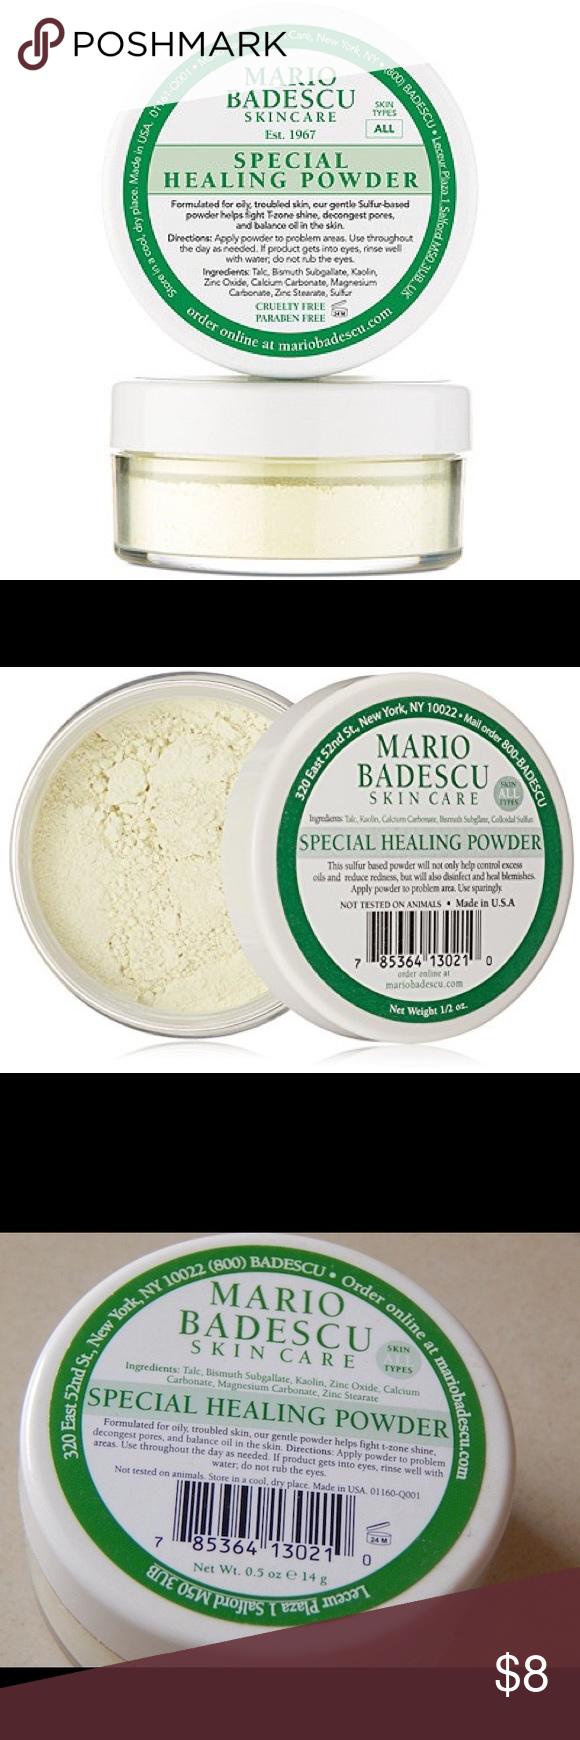 Mario Badescu Special Healing Powder Mario Badescu Healing Powder Puff